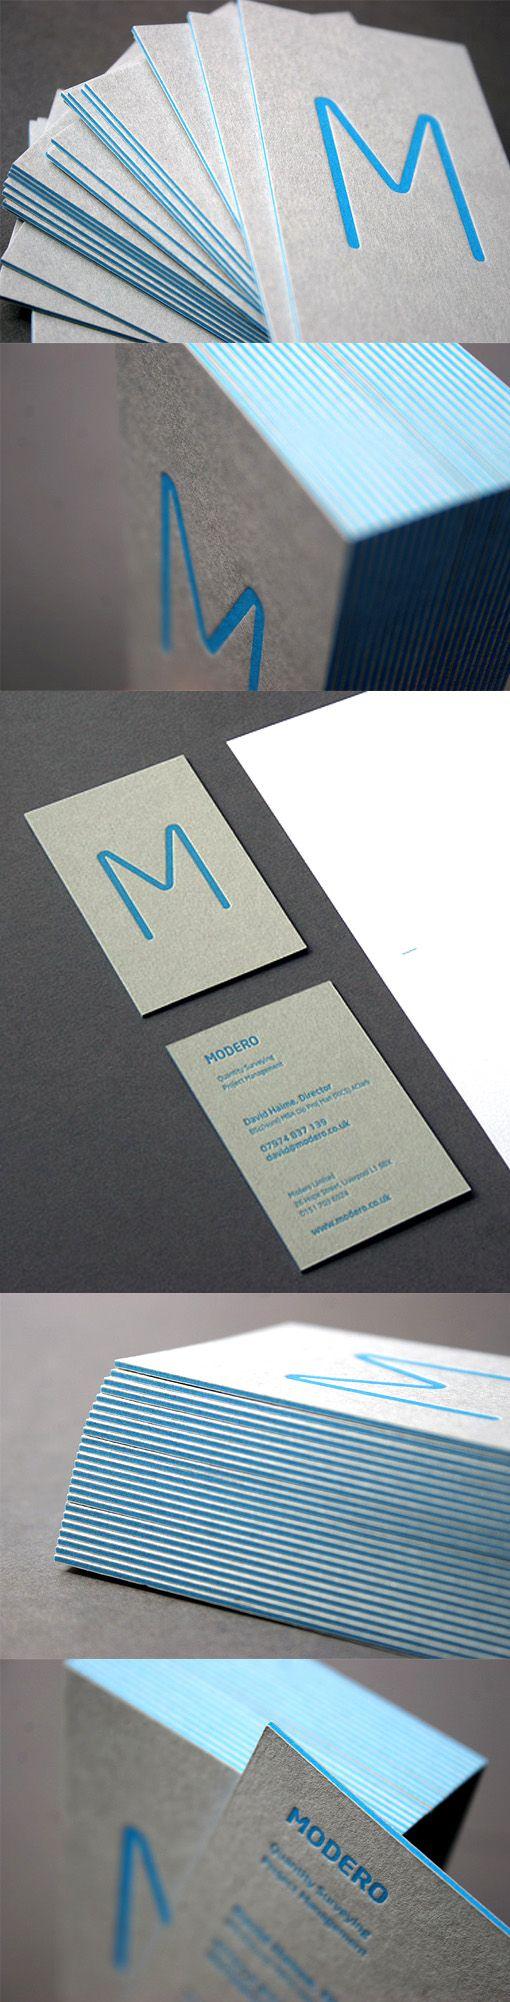 Minimalist business card letterpress printed on recycled card stock minimalist business card letterpress printed on recycled card stock colourmoves